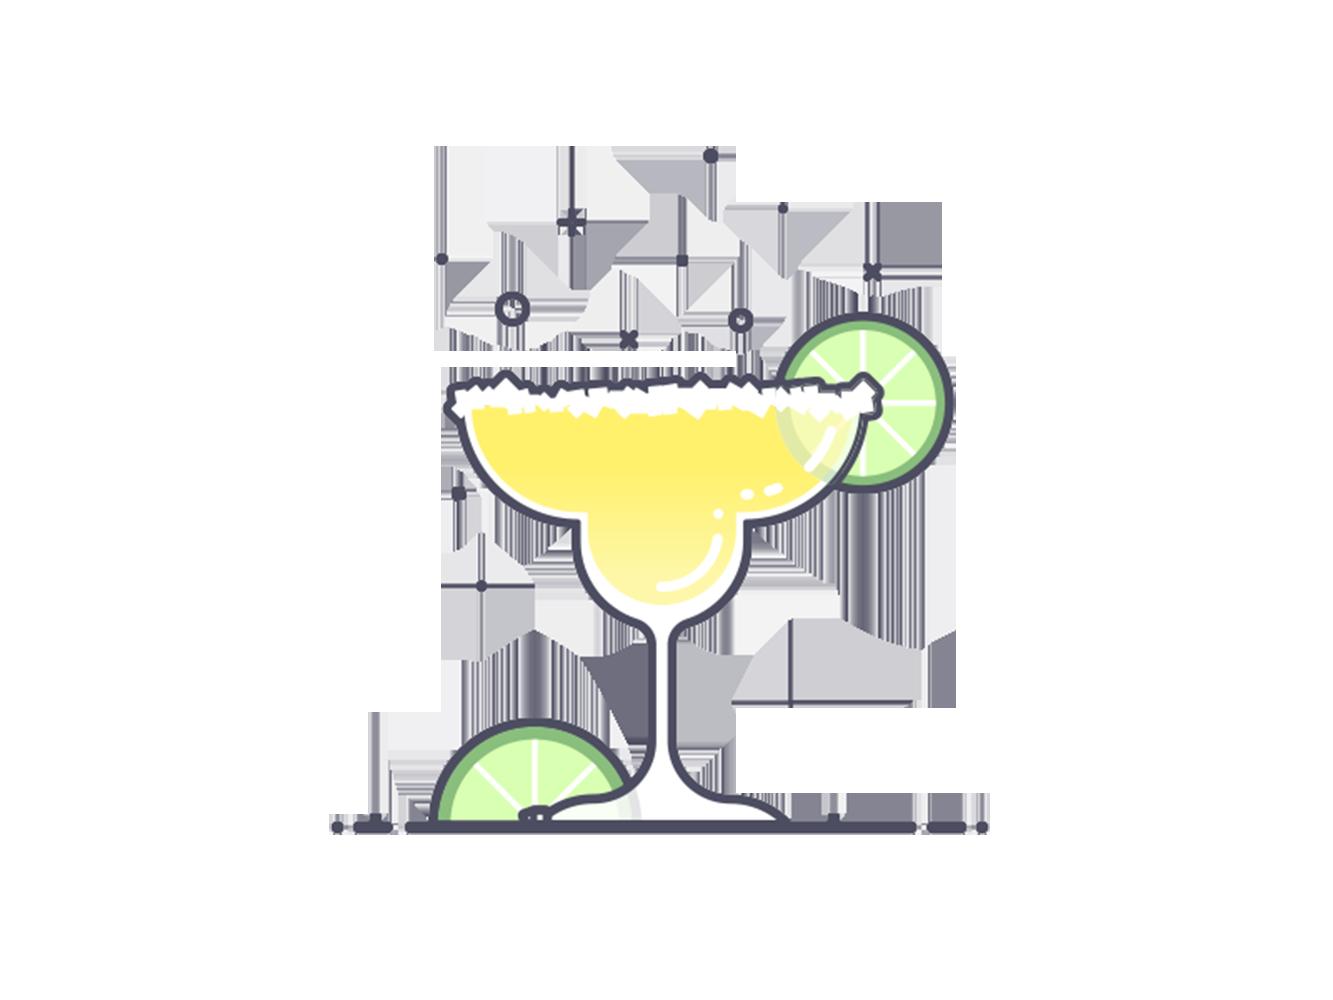 Cocktail limoncello lemon illustration. Cocktails clipart strawberry margarita